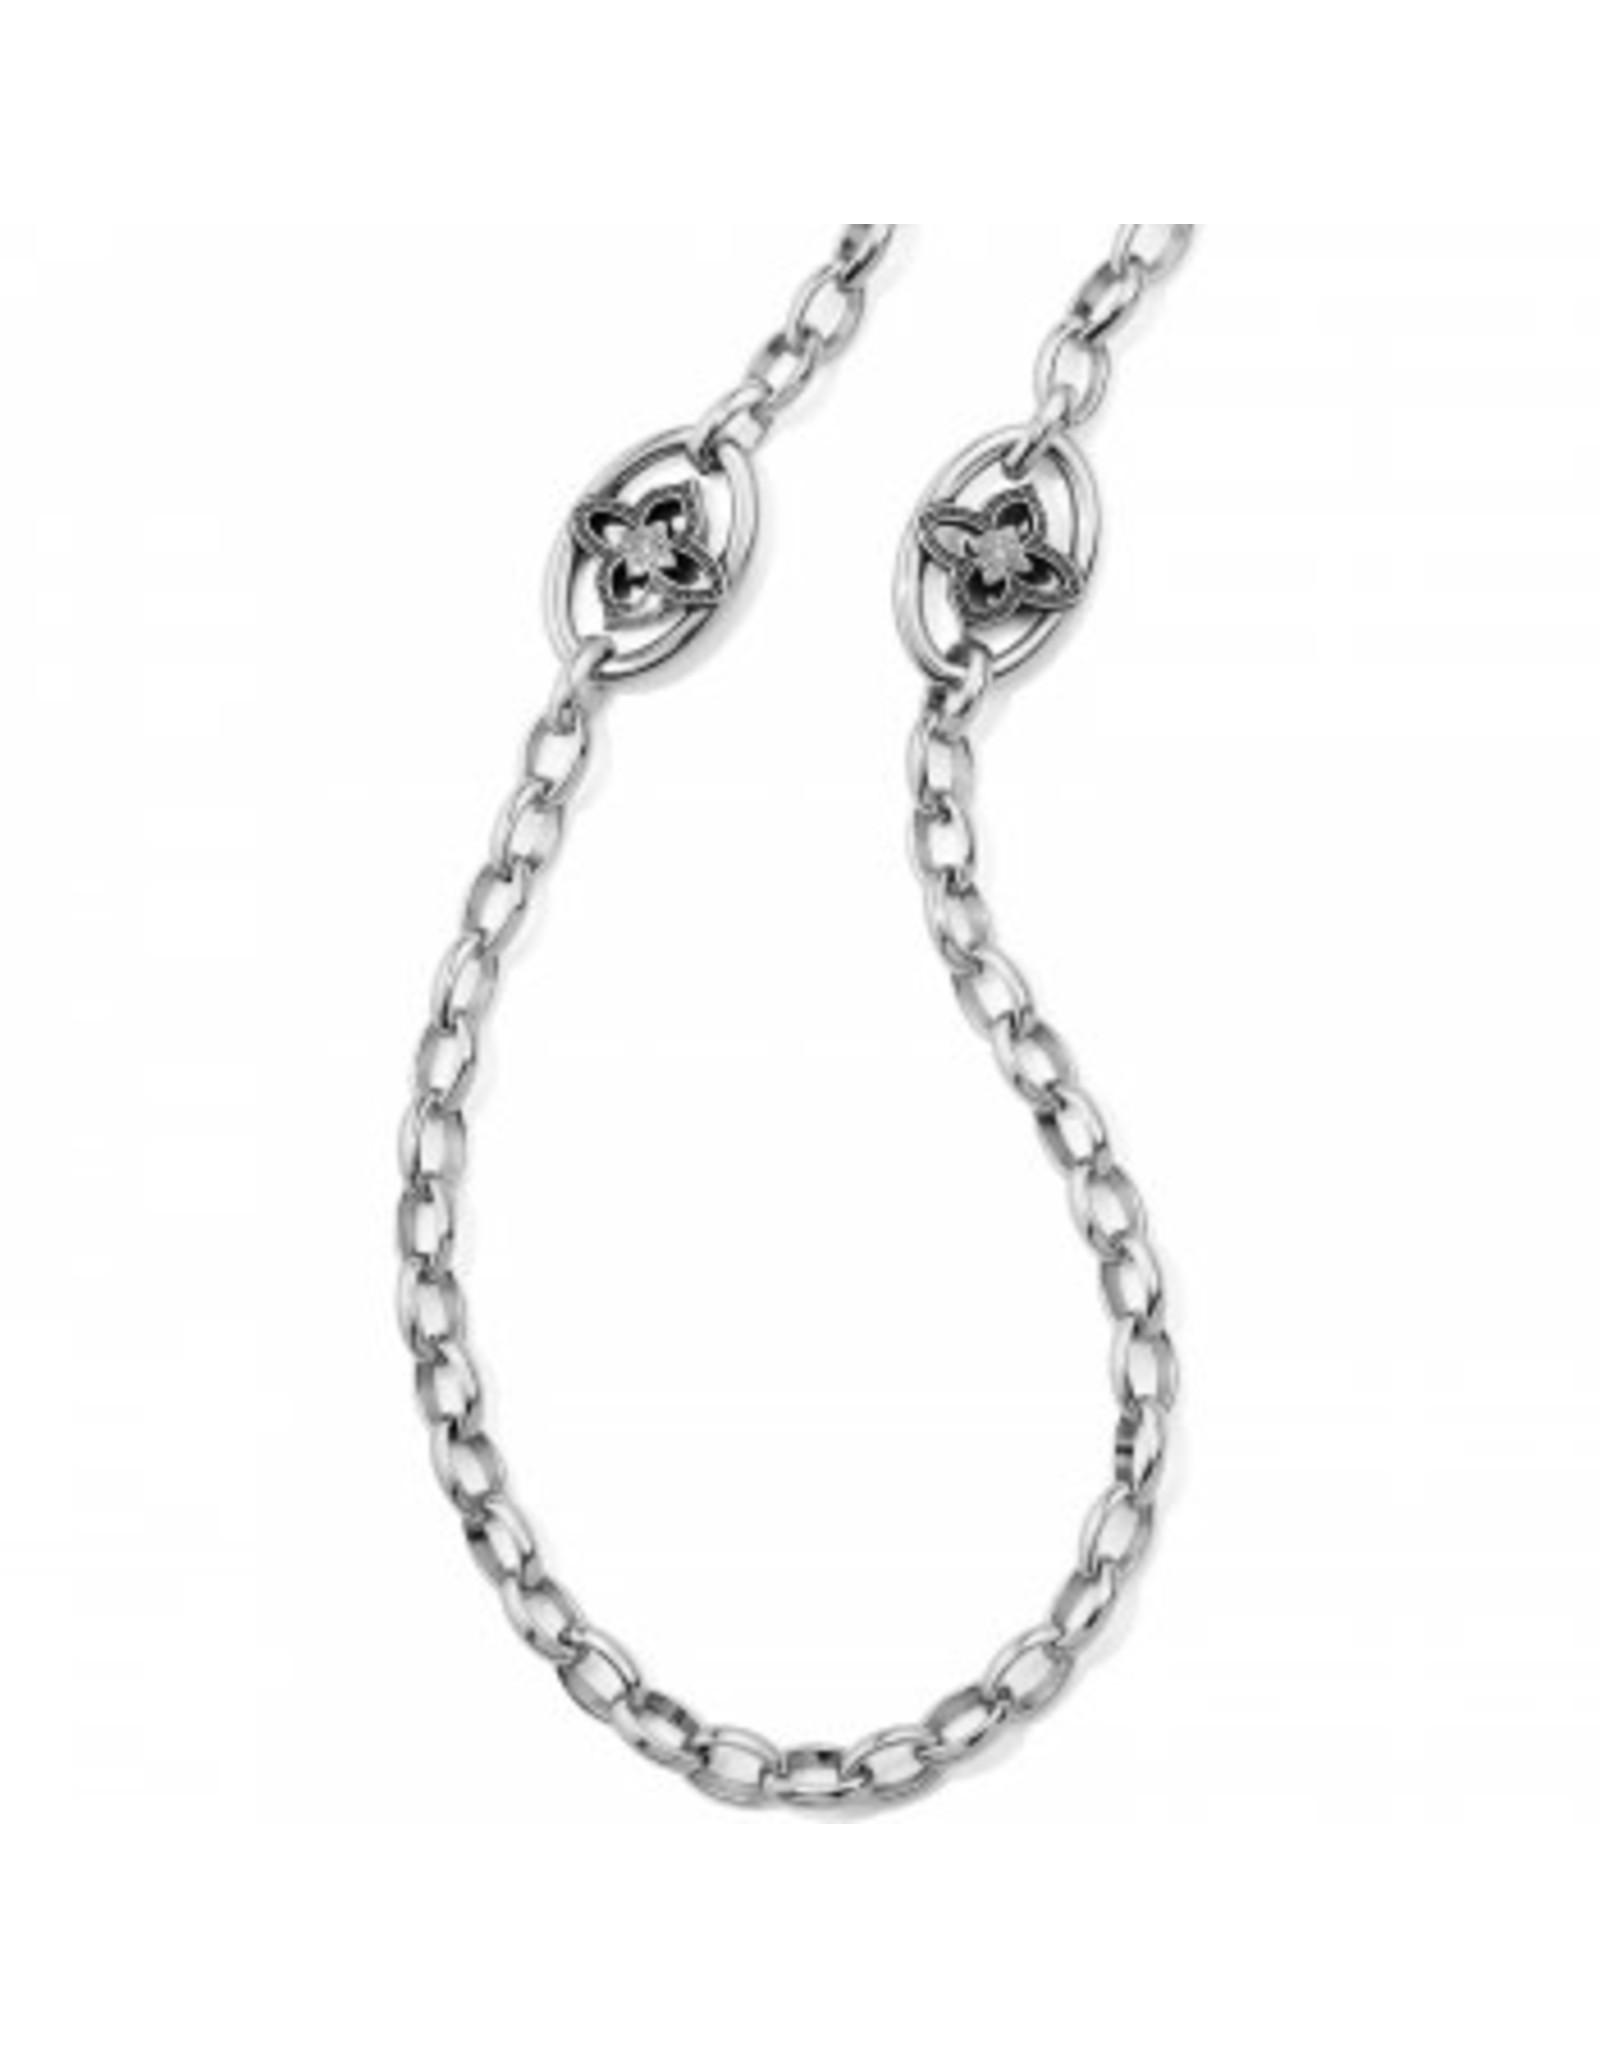 Brighton Toledo collective Long Necklace